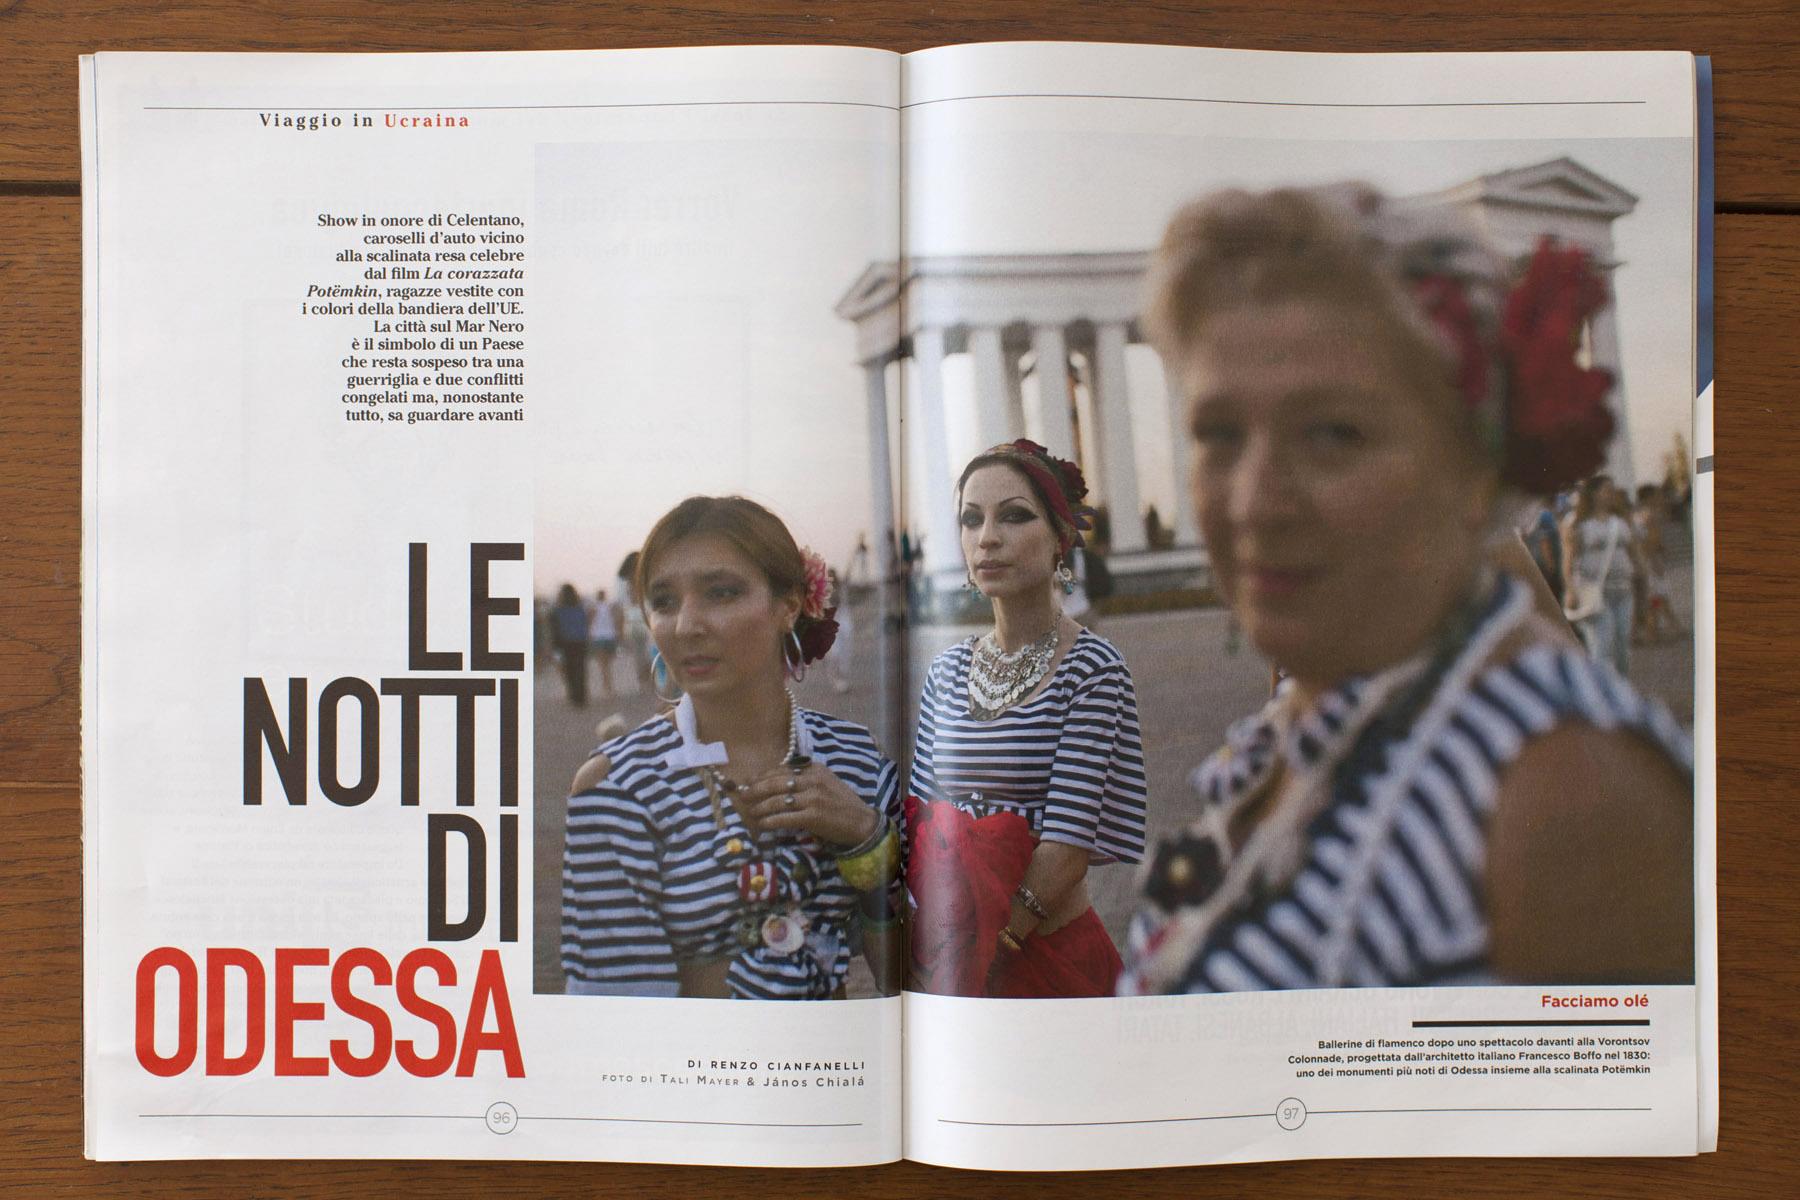 Sette magazine: Odessa. (August 2017)